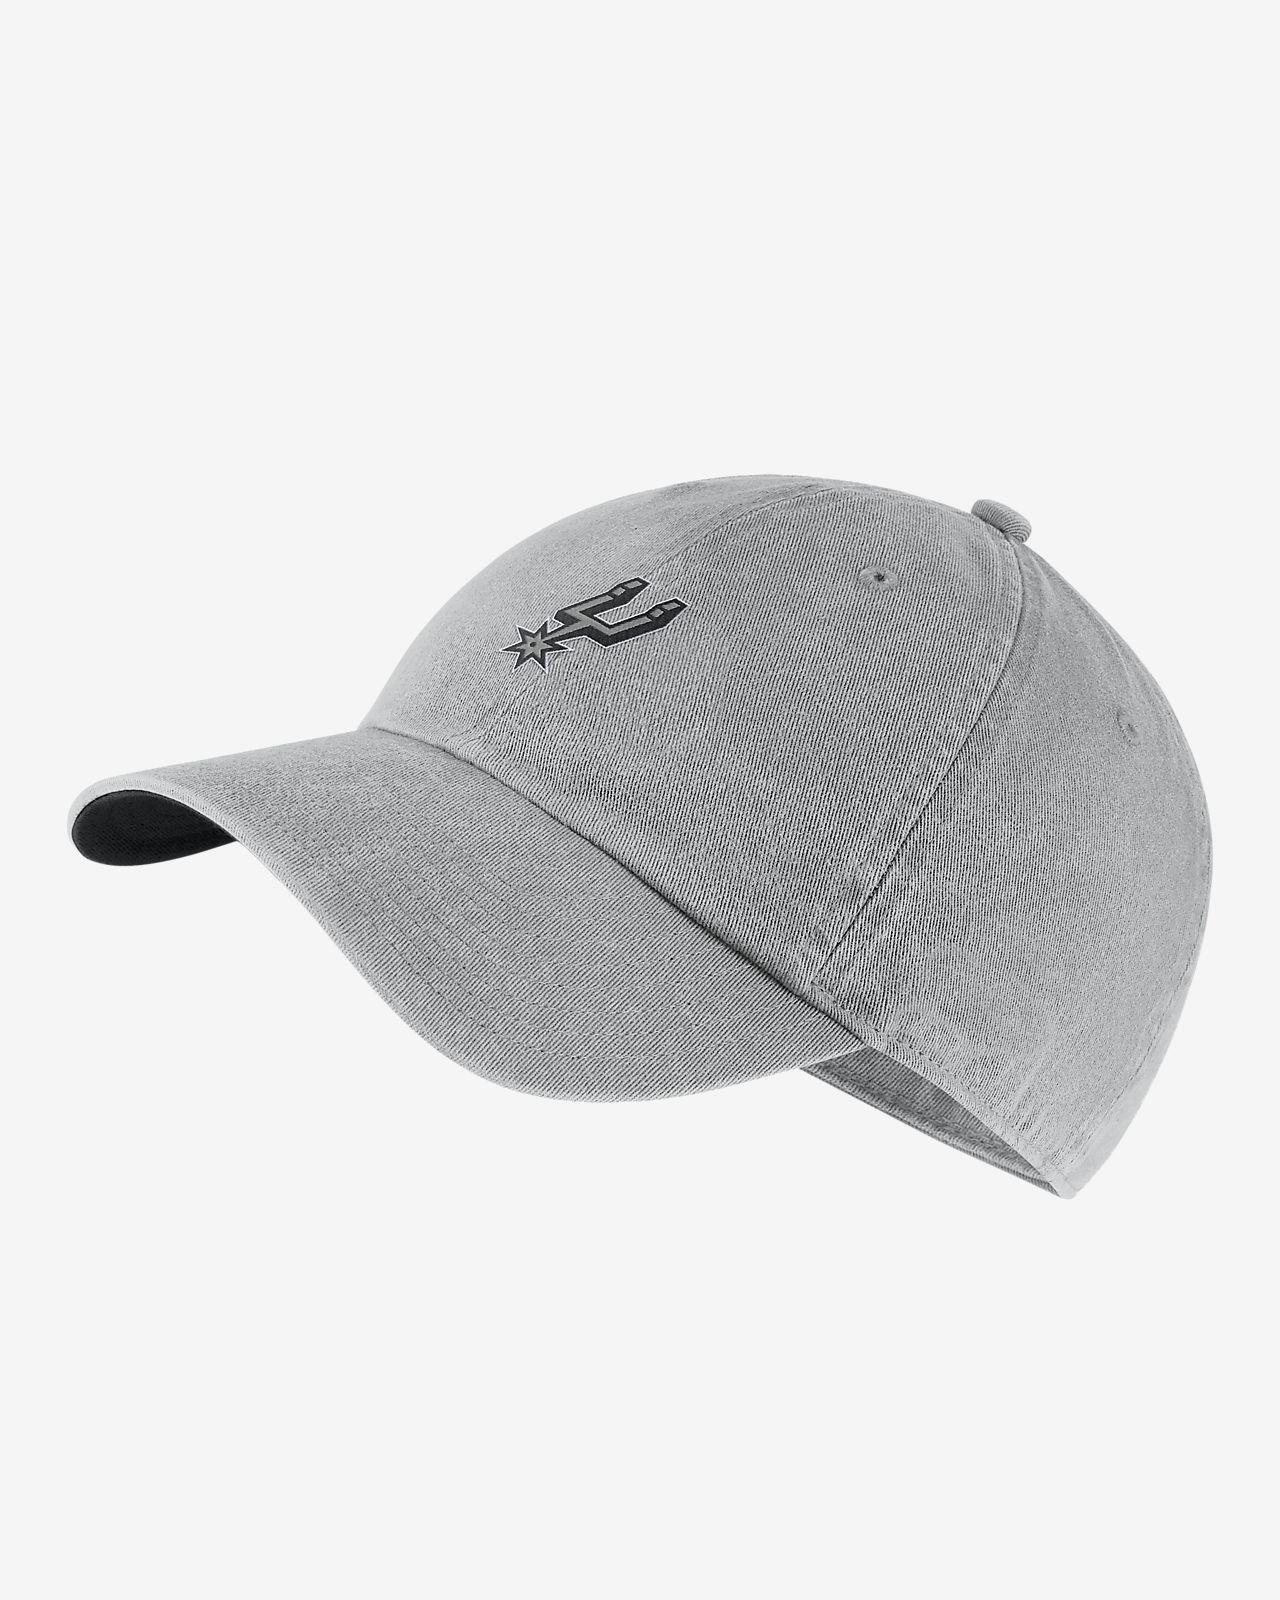 San Antonio Spurs Nike Heritage86 NBA Hat